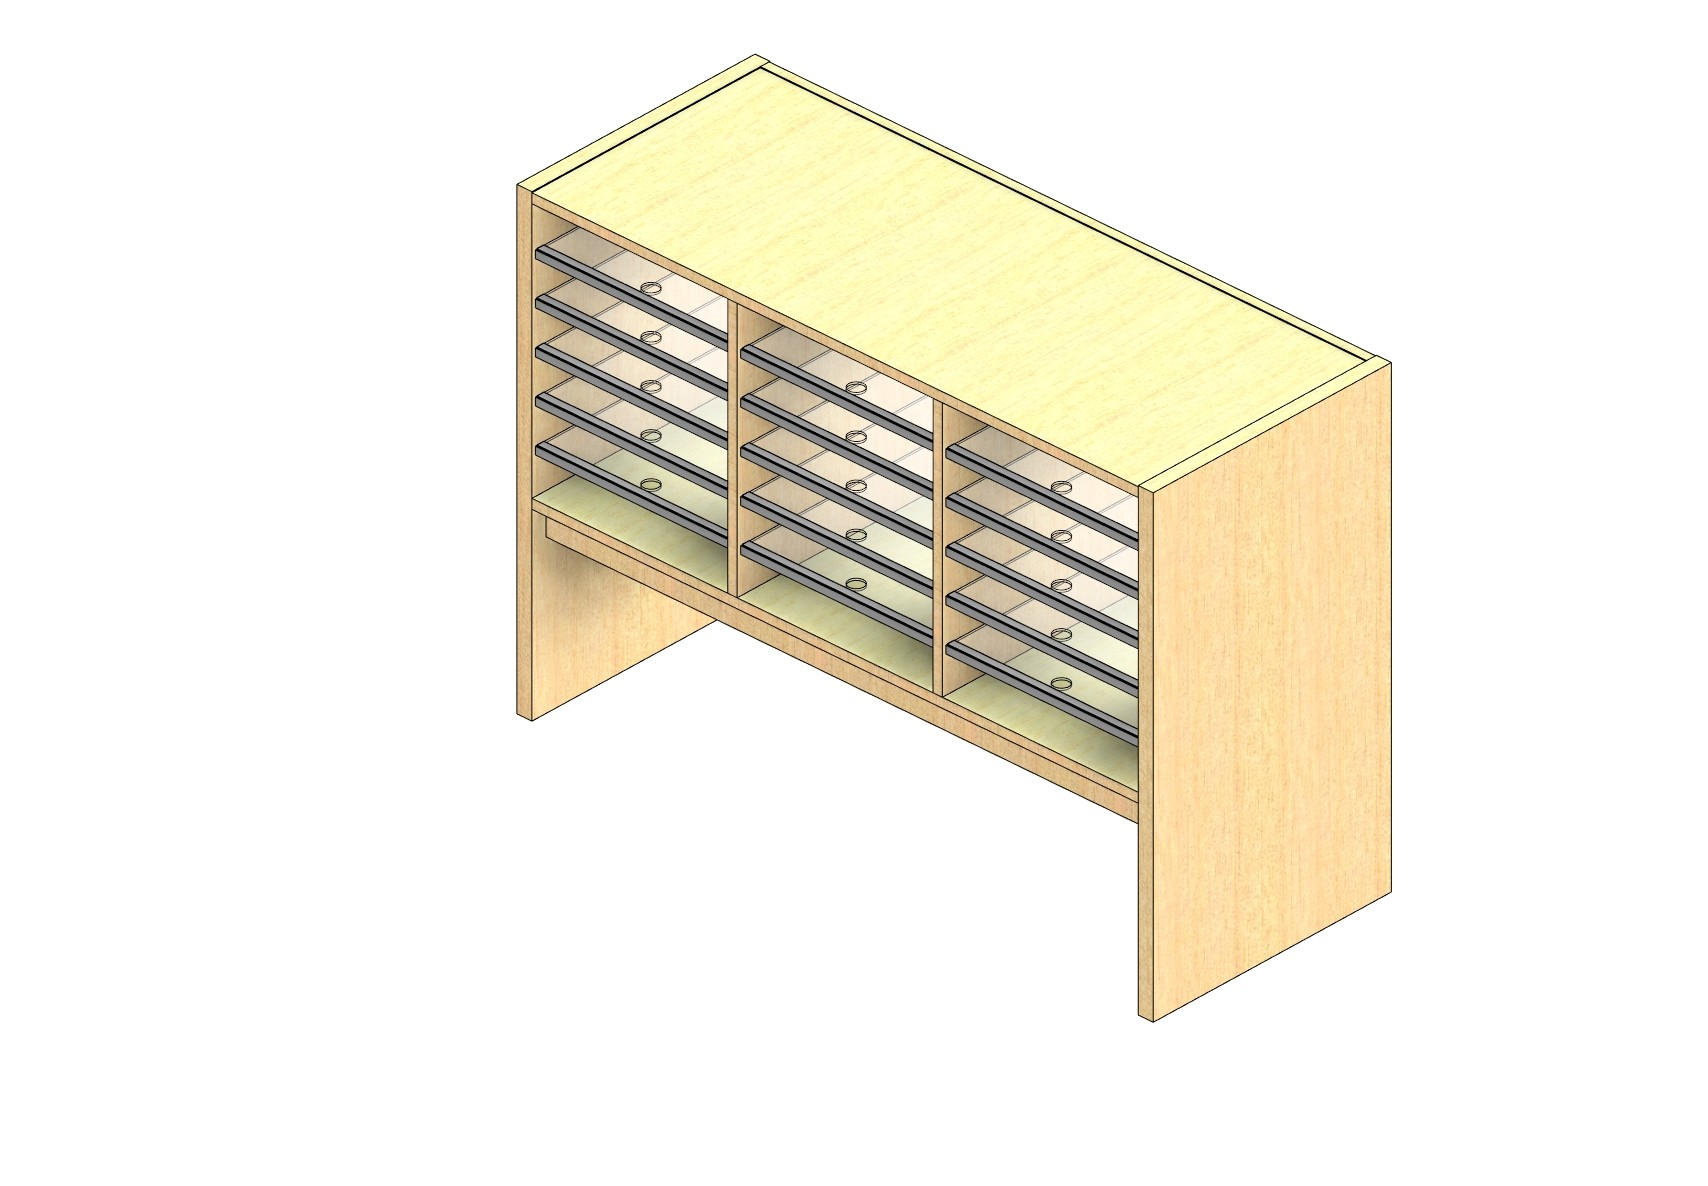 "Oversize Sized Plexi Back Sort Module - 3 Columns - 18"" Sorting Height w/ 12"" Riser"